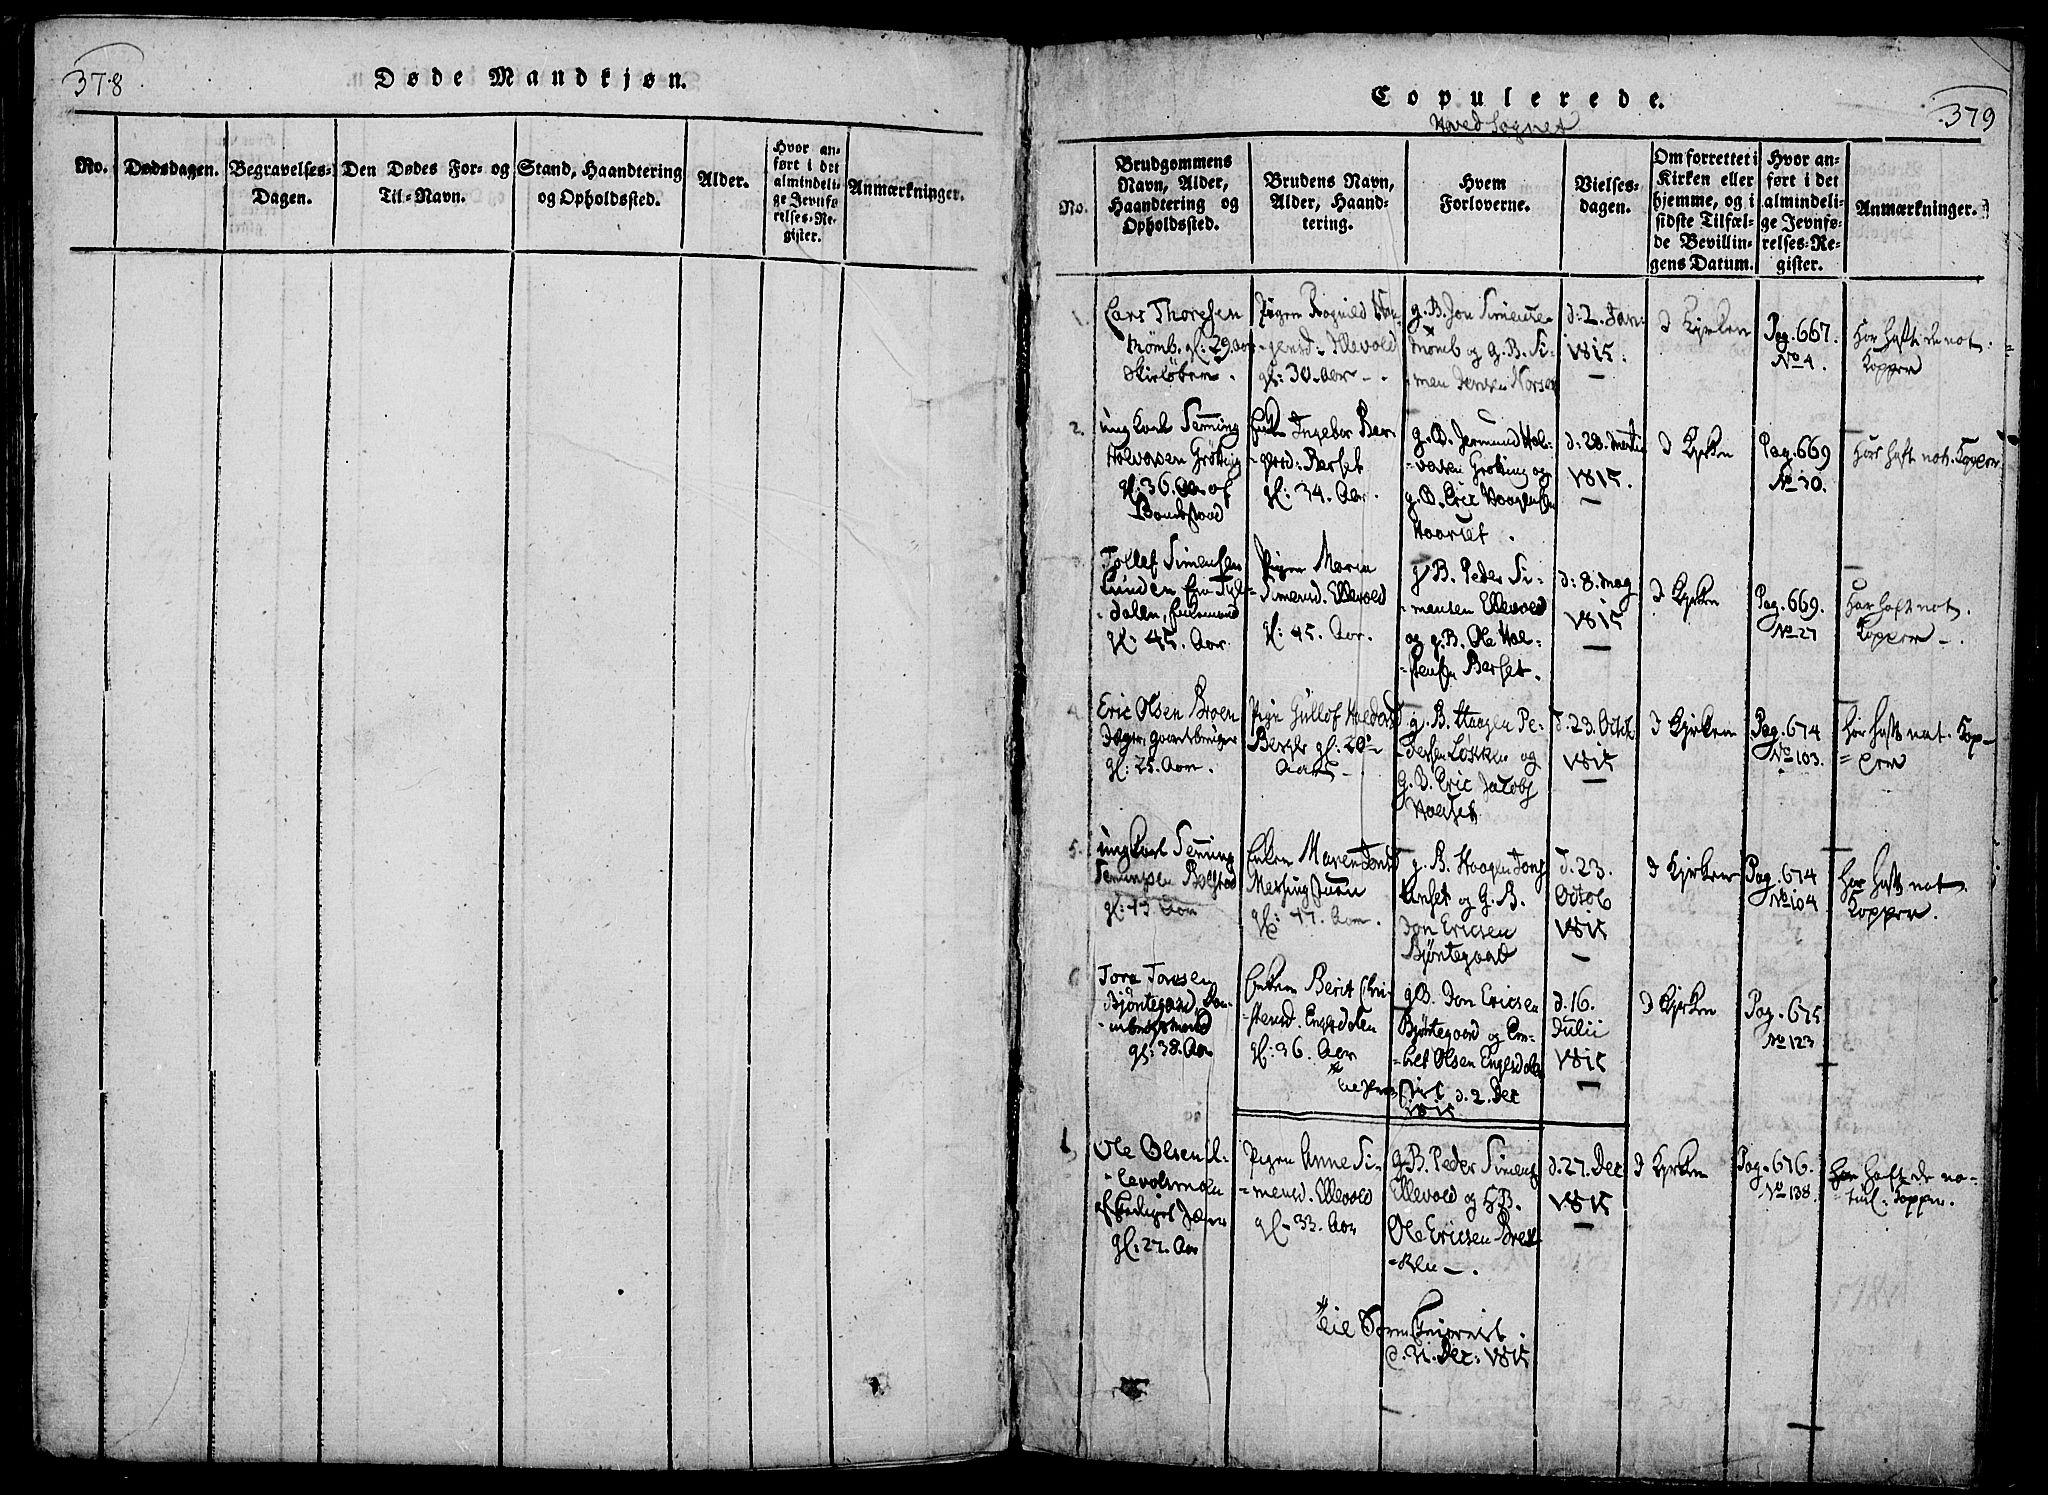 SAH, Rendalen prestekontor, H/Ha/Haa/L0003: Ministerialbok nr. 3, 1815-1829, s. 378-379